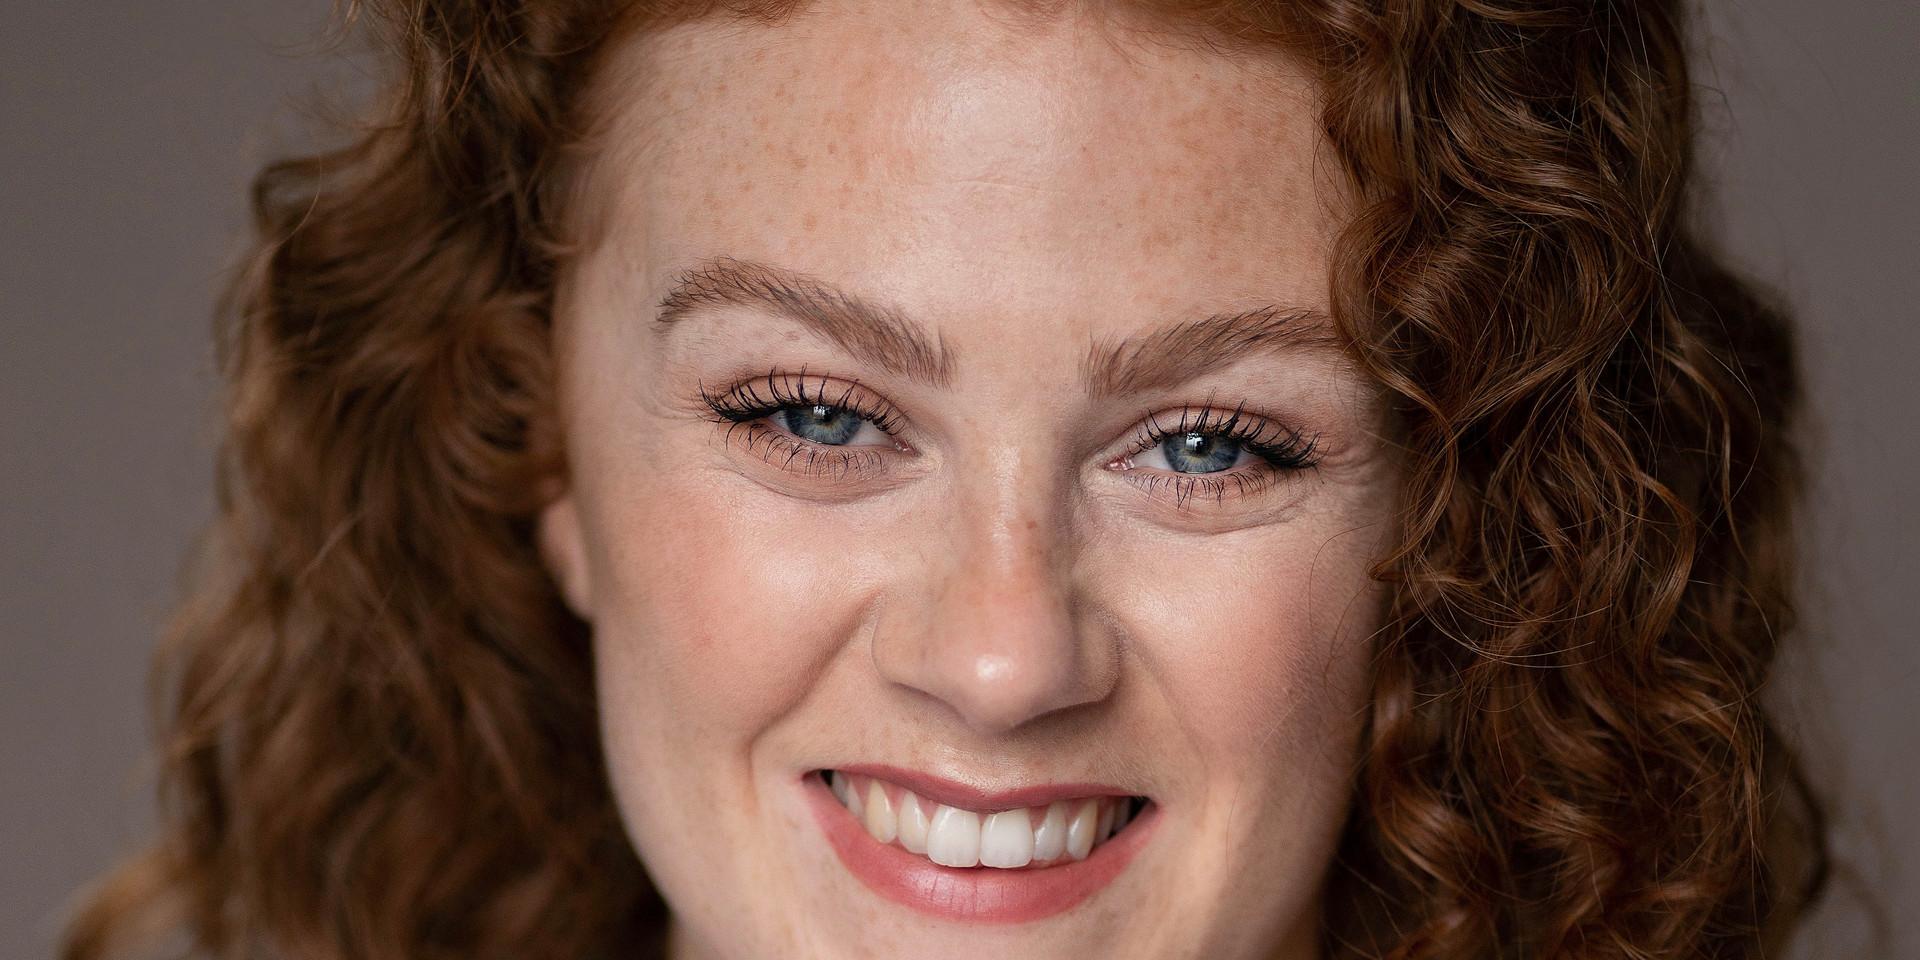 Holly Jane